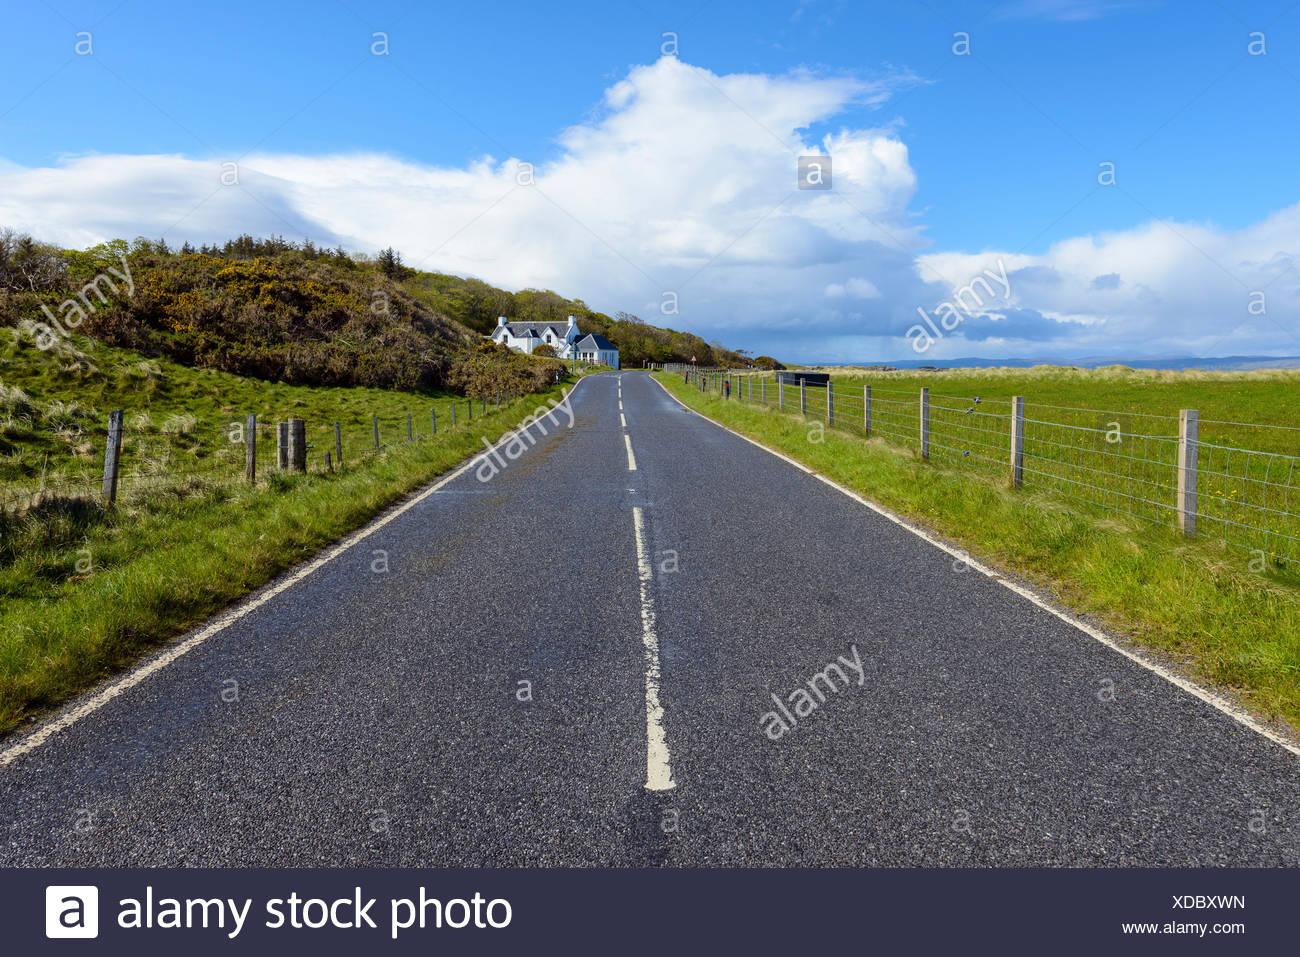 Coastal road after rainstorm, Mallaig, Scotland, United Kingdom - Stock Image